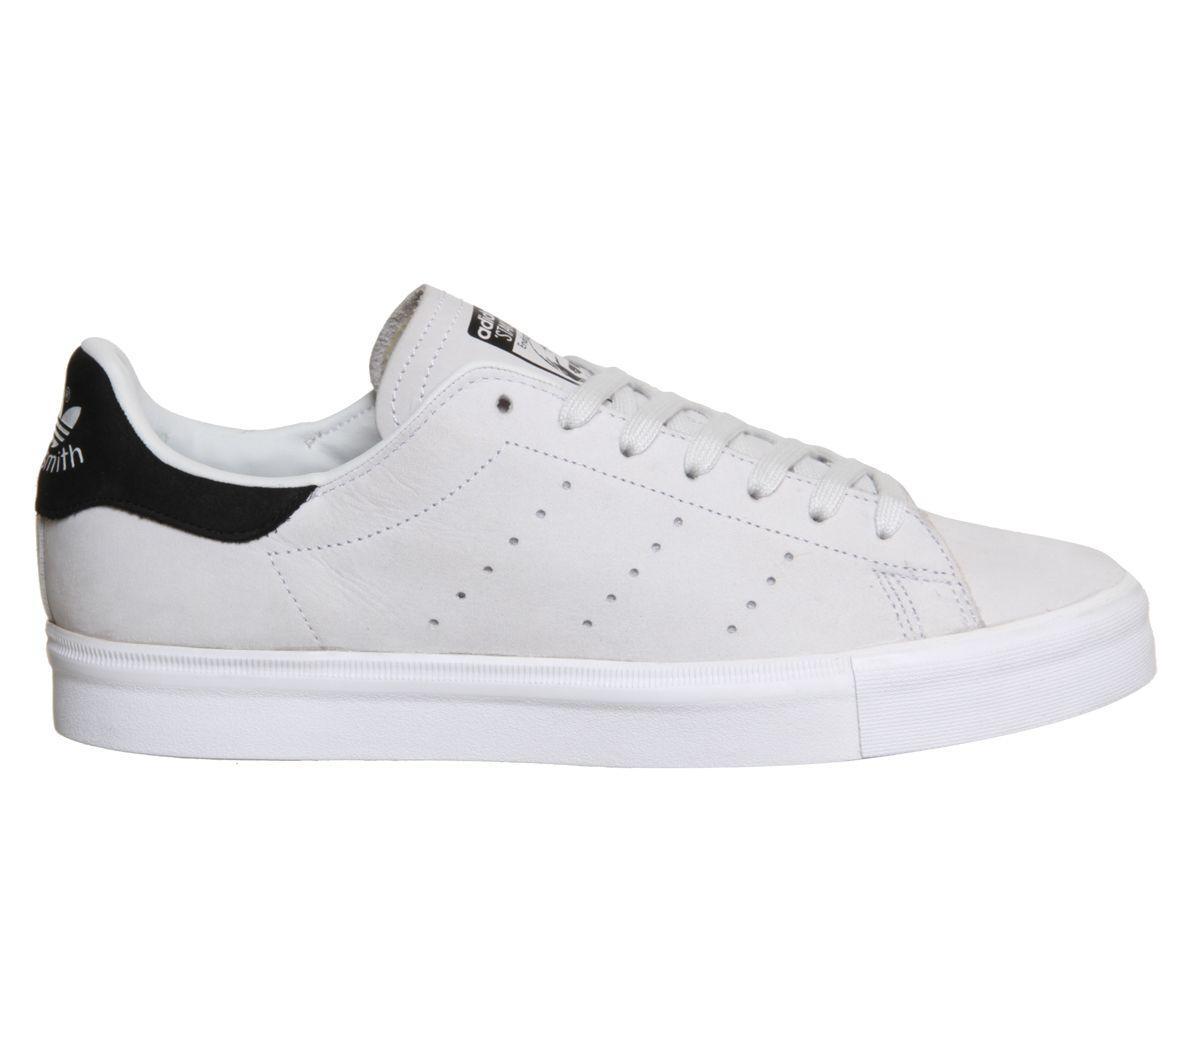 Adidas Stan Smith Vulc White Black Nubuck - Unisex Sportschuhe